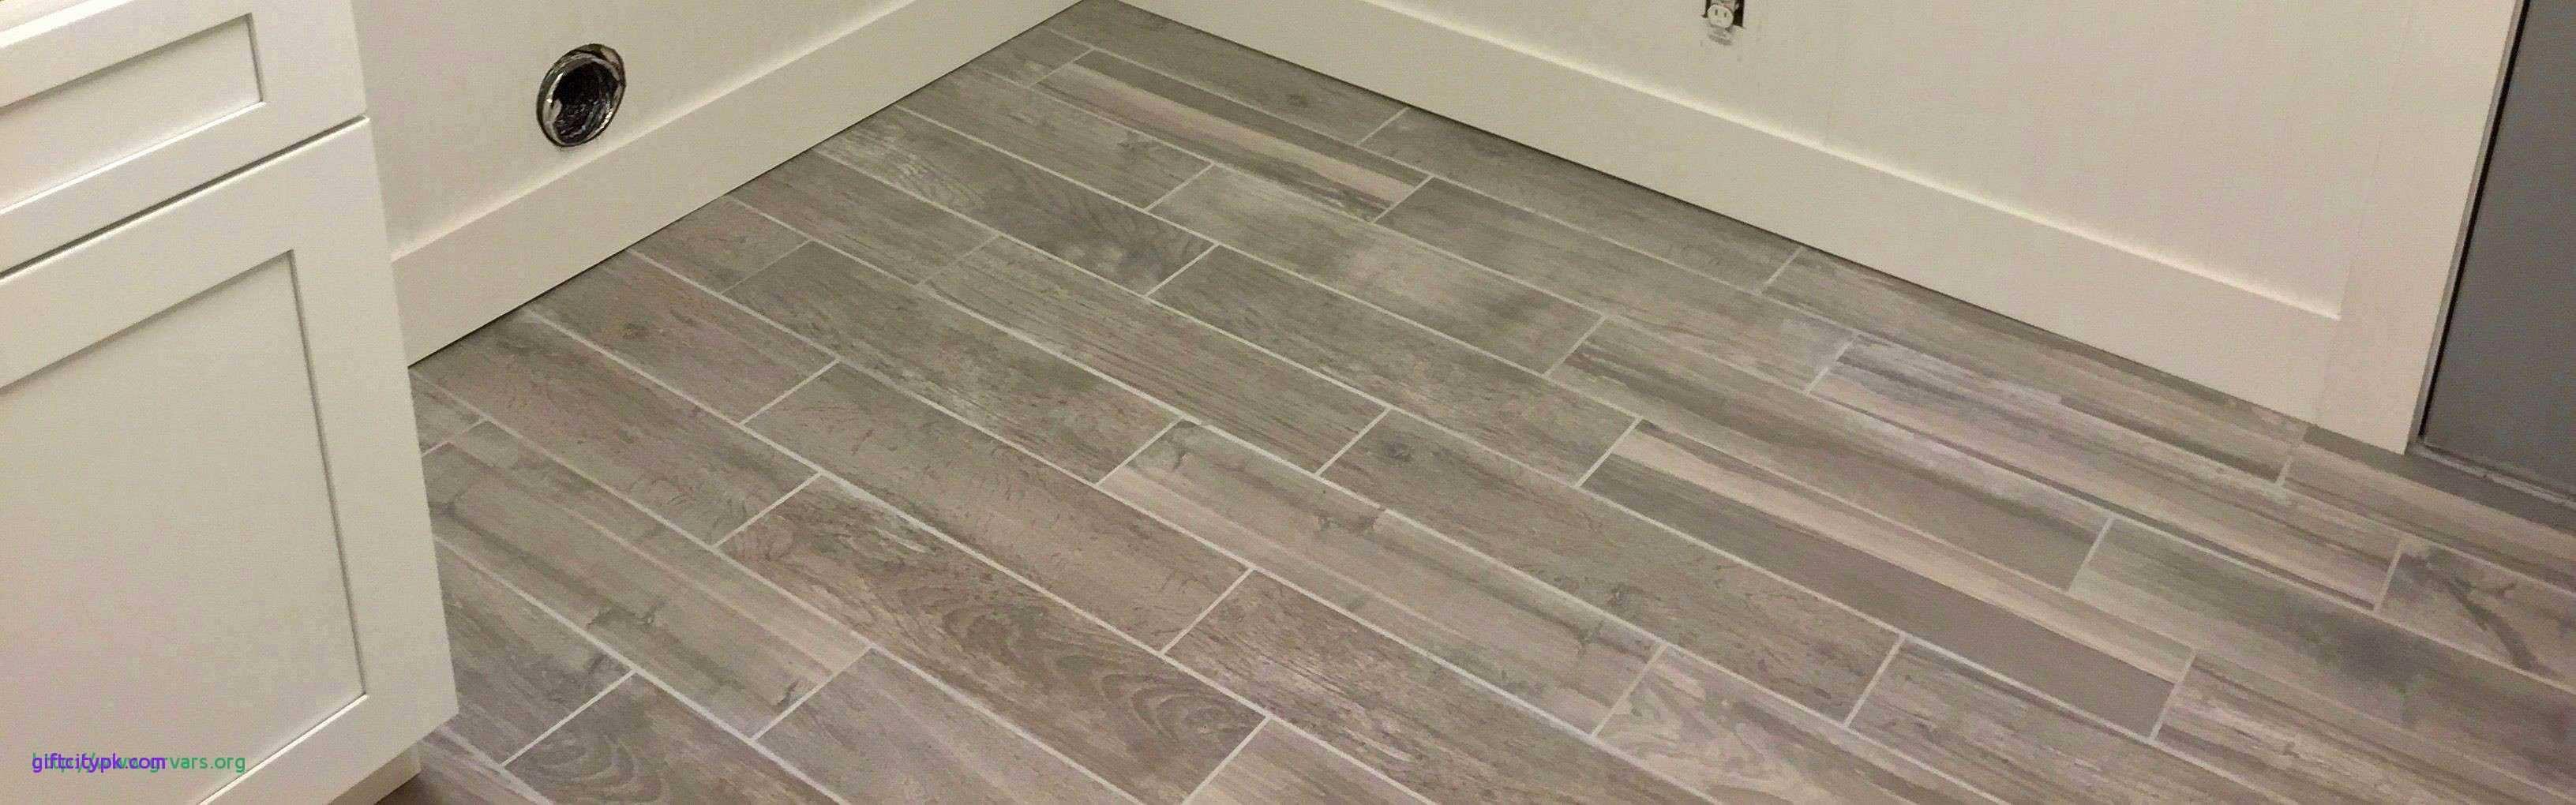 installing oak hardwood floors of chemical free flooring giftcitypk giftcitypk throughout elegant unique bathroom tiling ideas best h sink install bathroom i 0d luxury shower tile